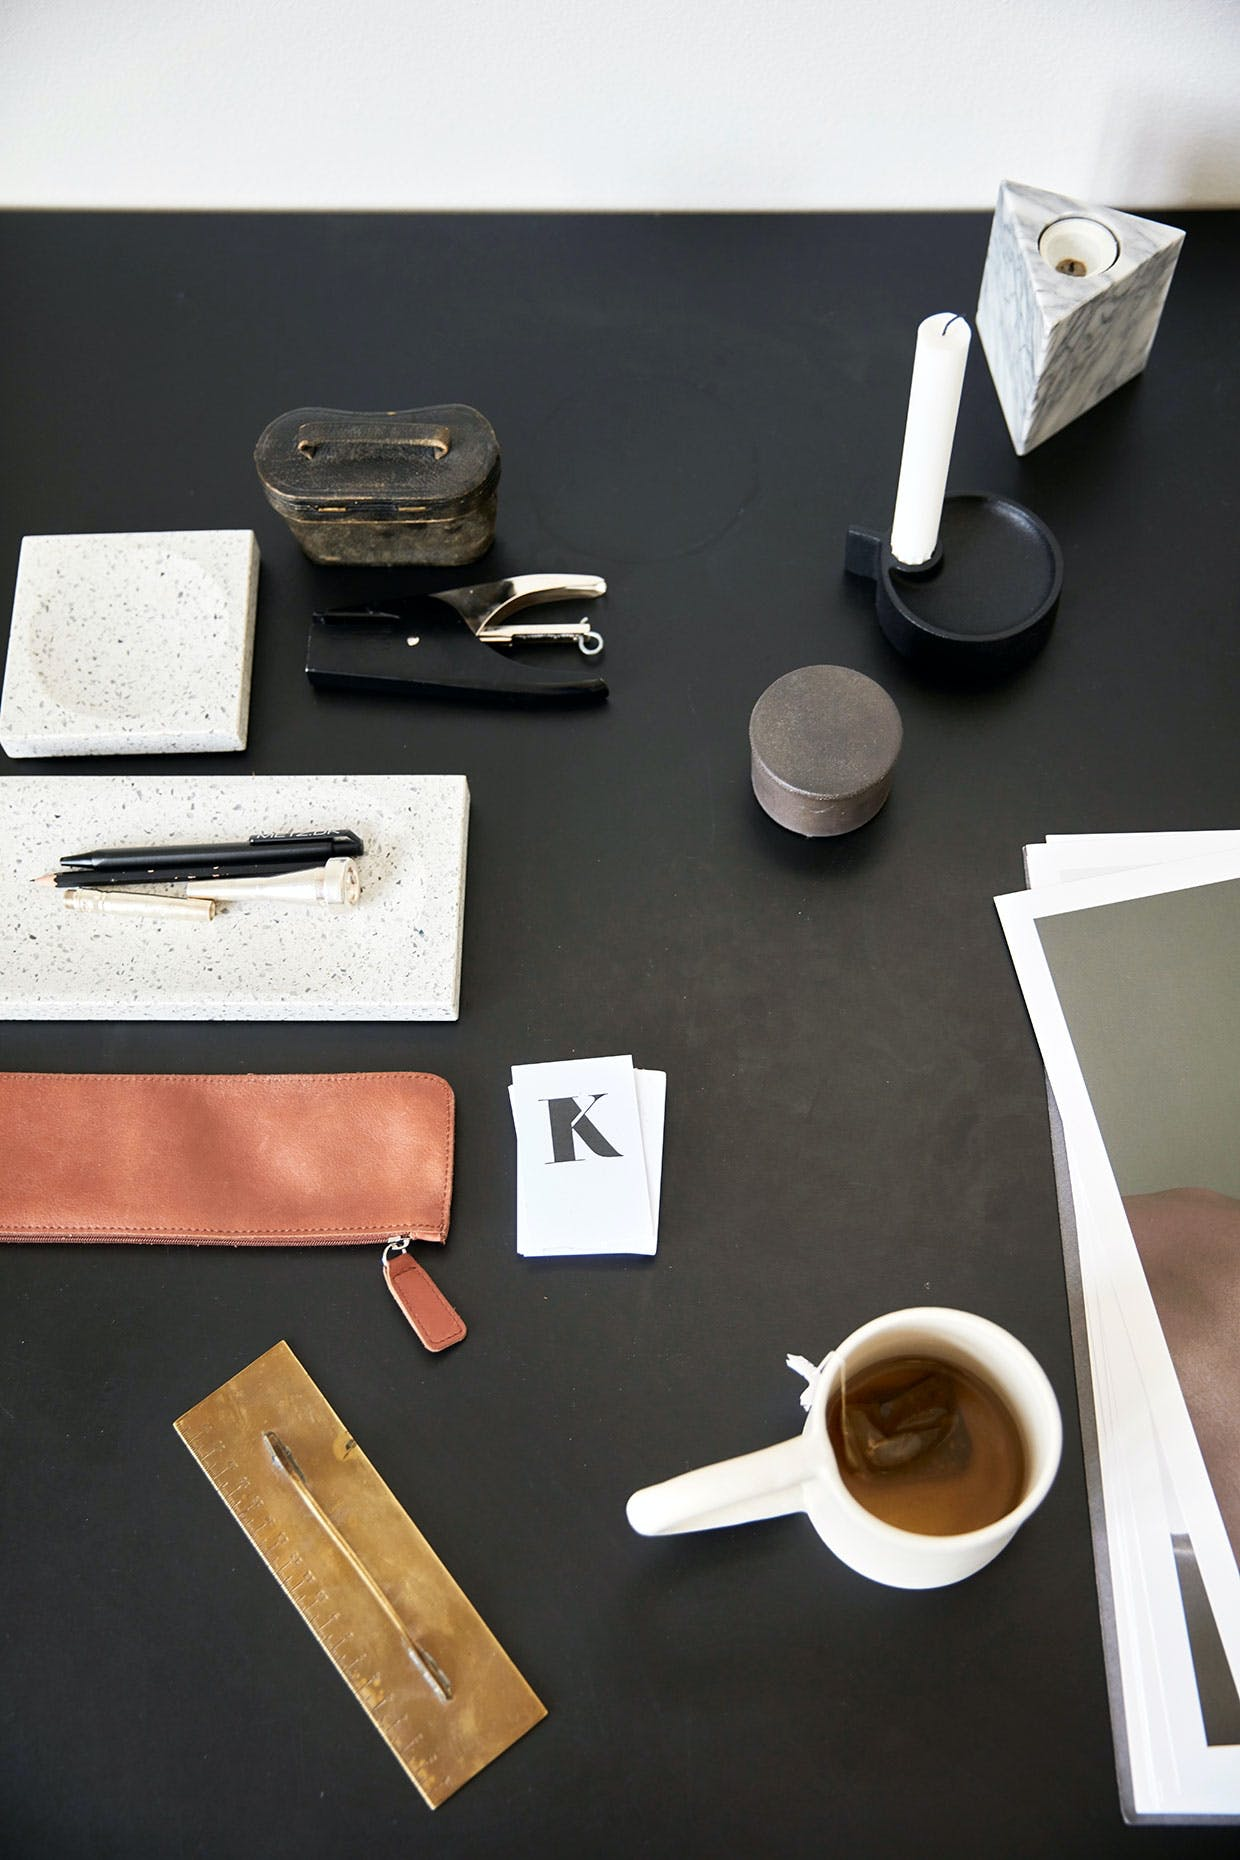 kontor skrivebord lysestage kristina dam kontorartikler